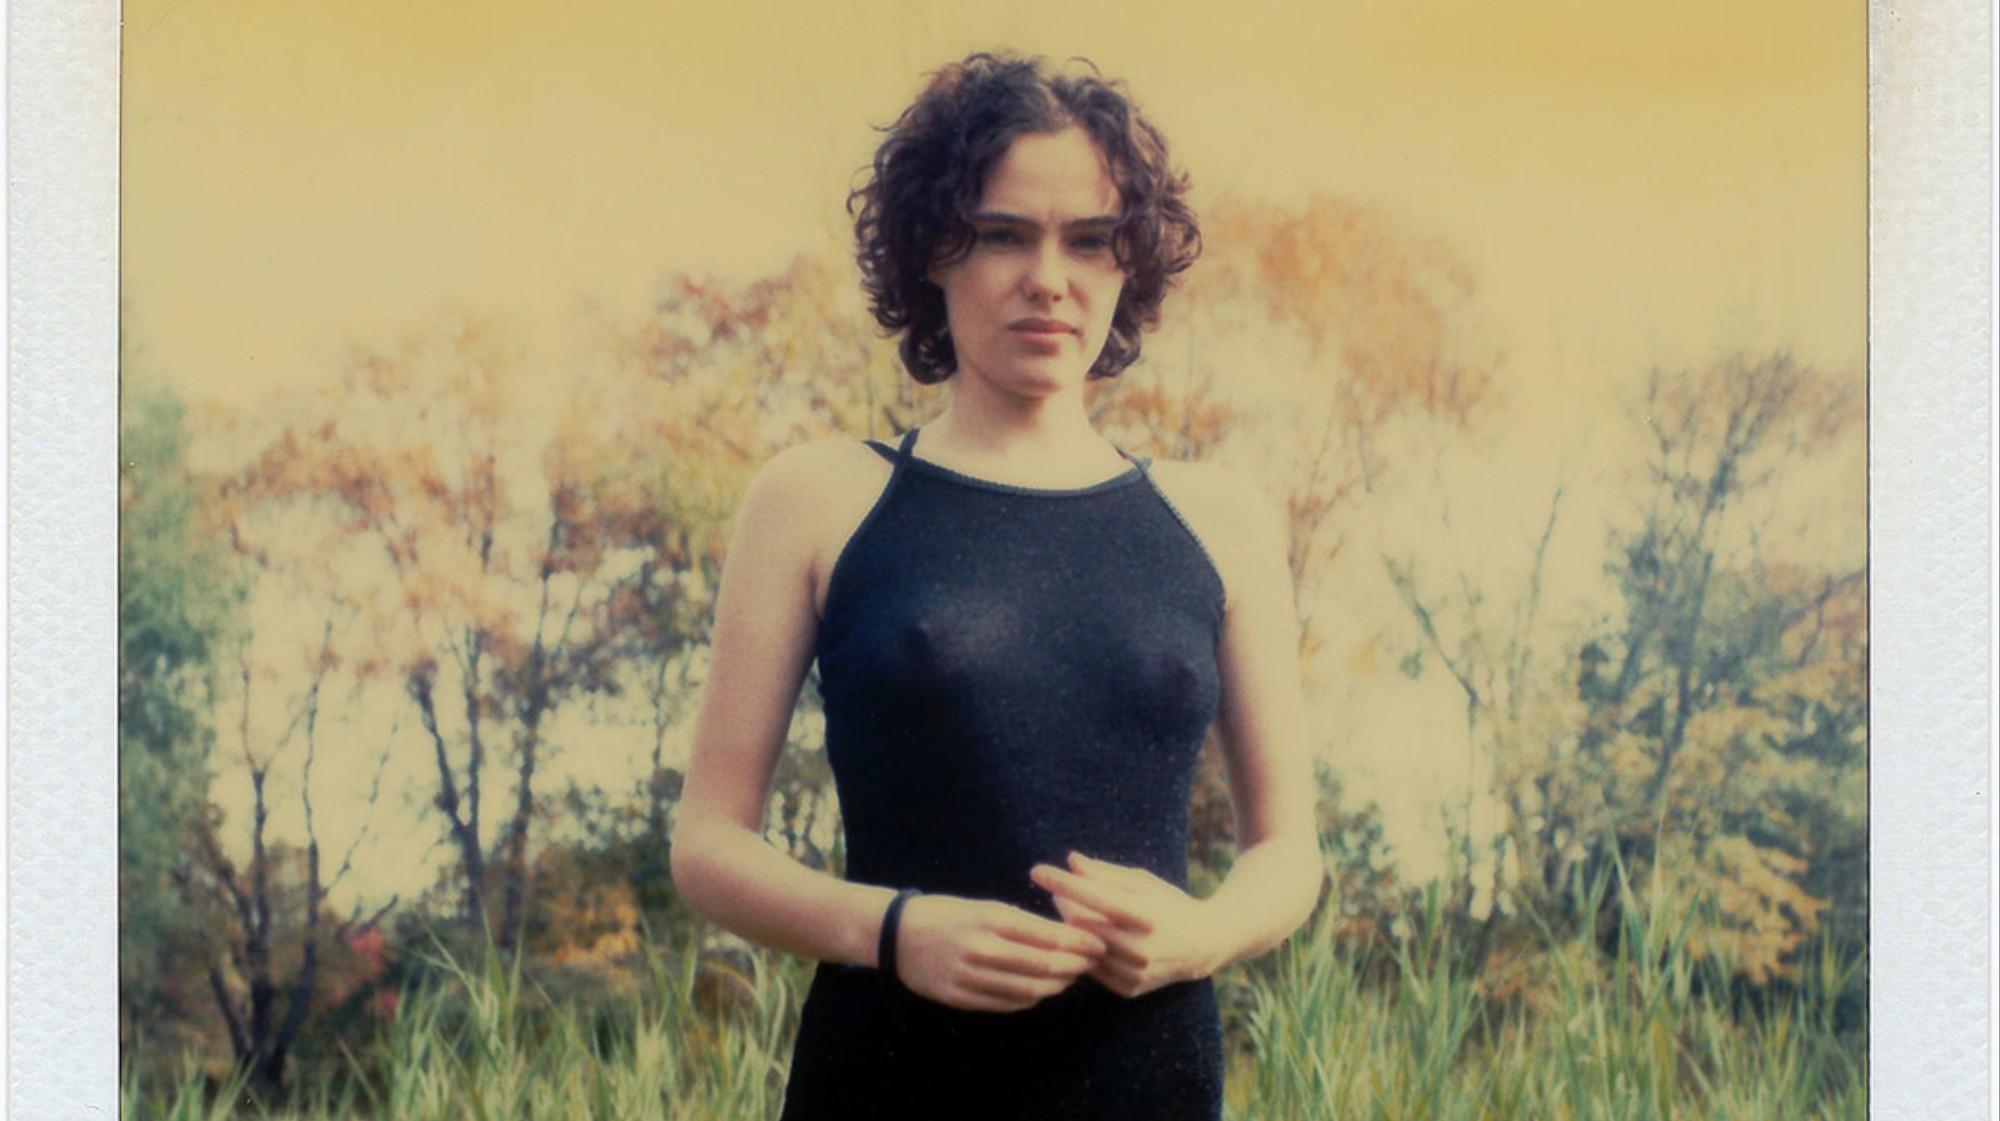 Alondra Naked richard kern's sexy, provocative and poetic polaroids - i-d